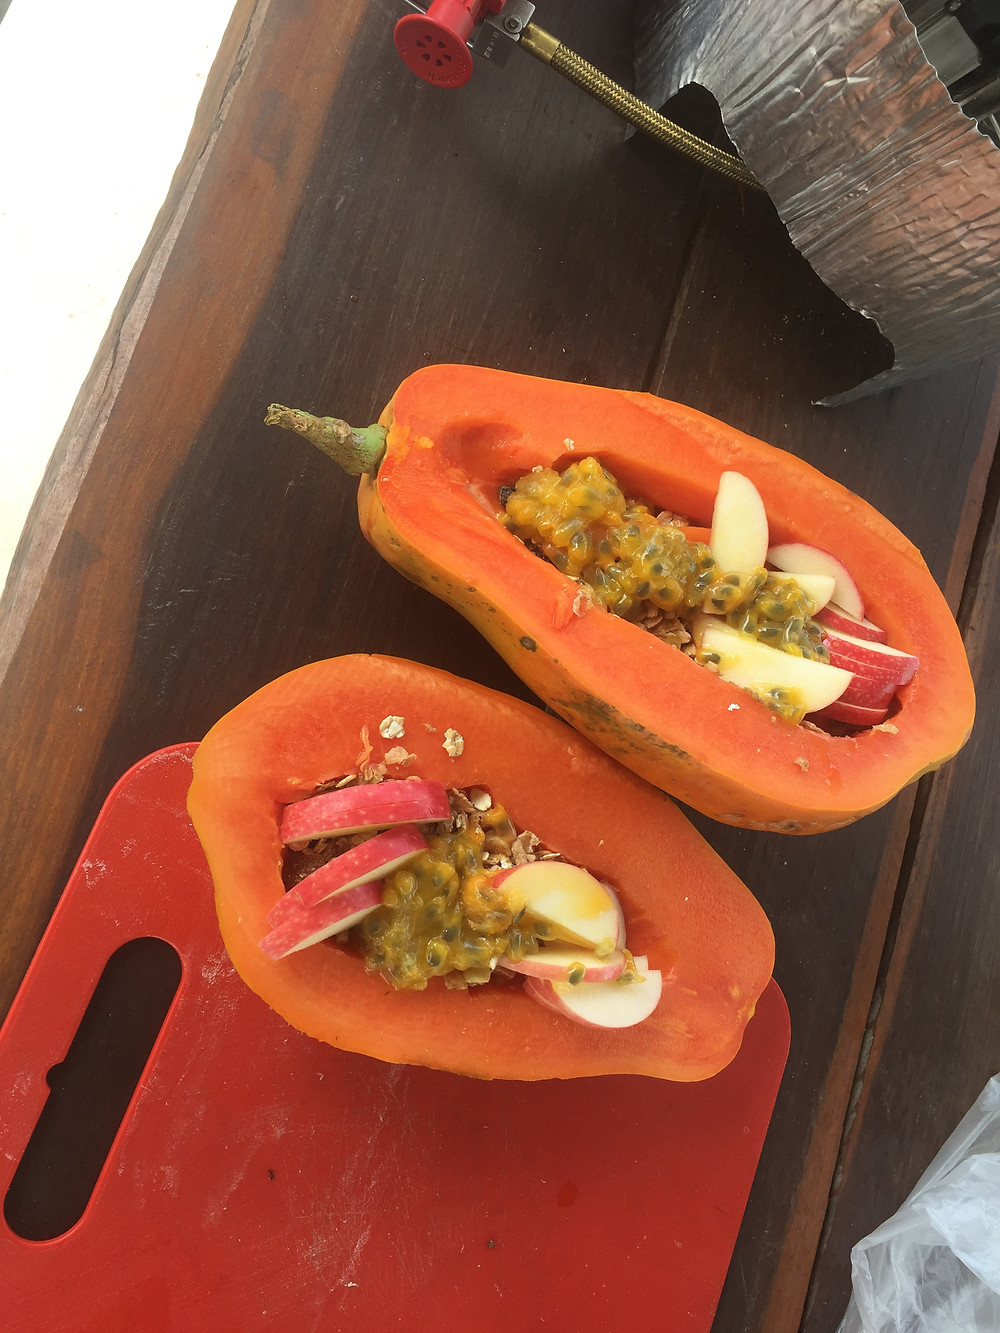 Papaya & passionfruit donated by Artemis station